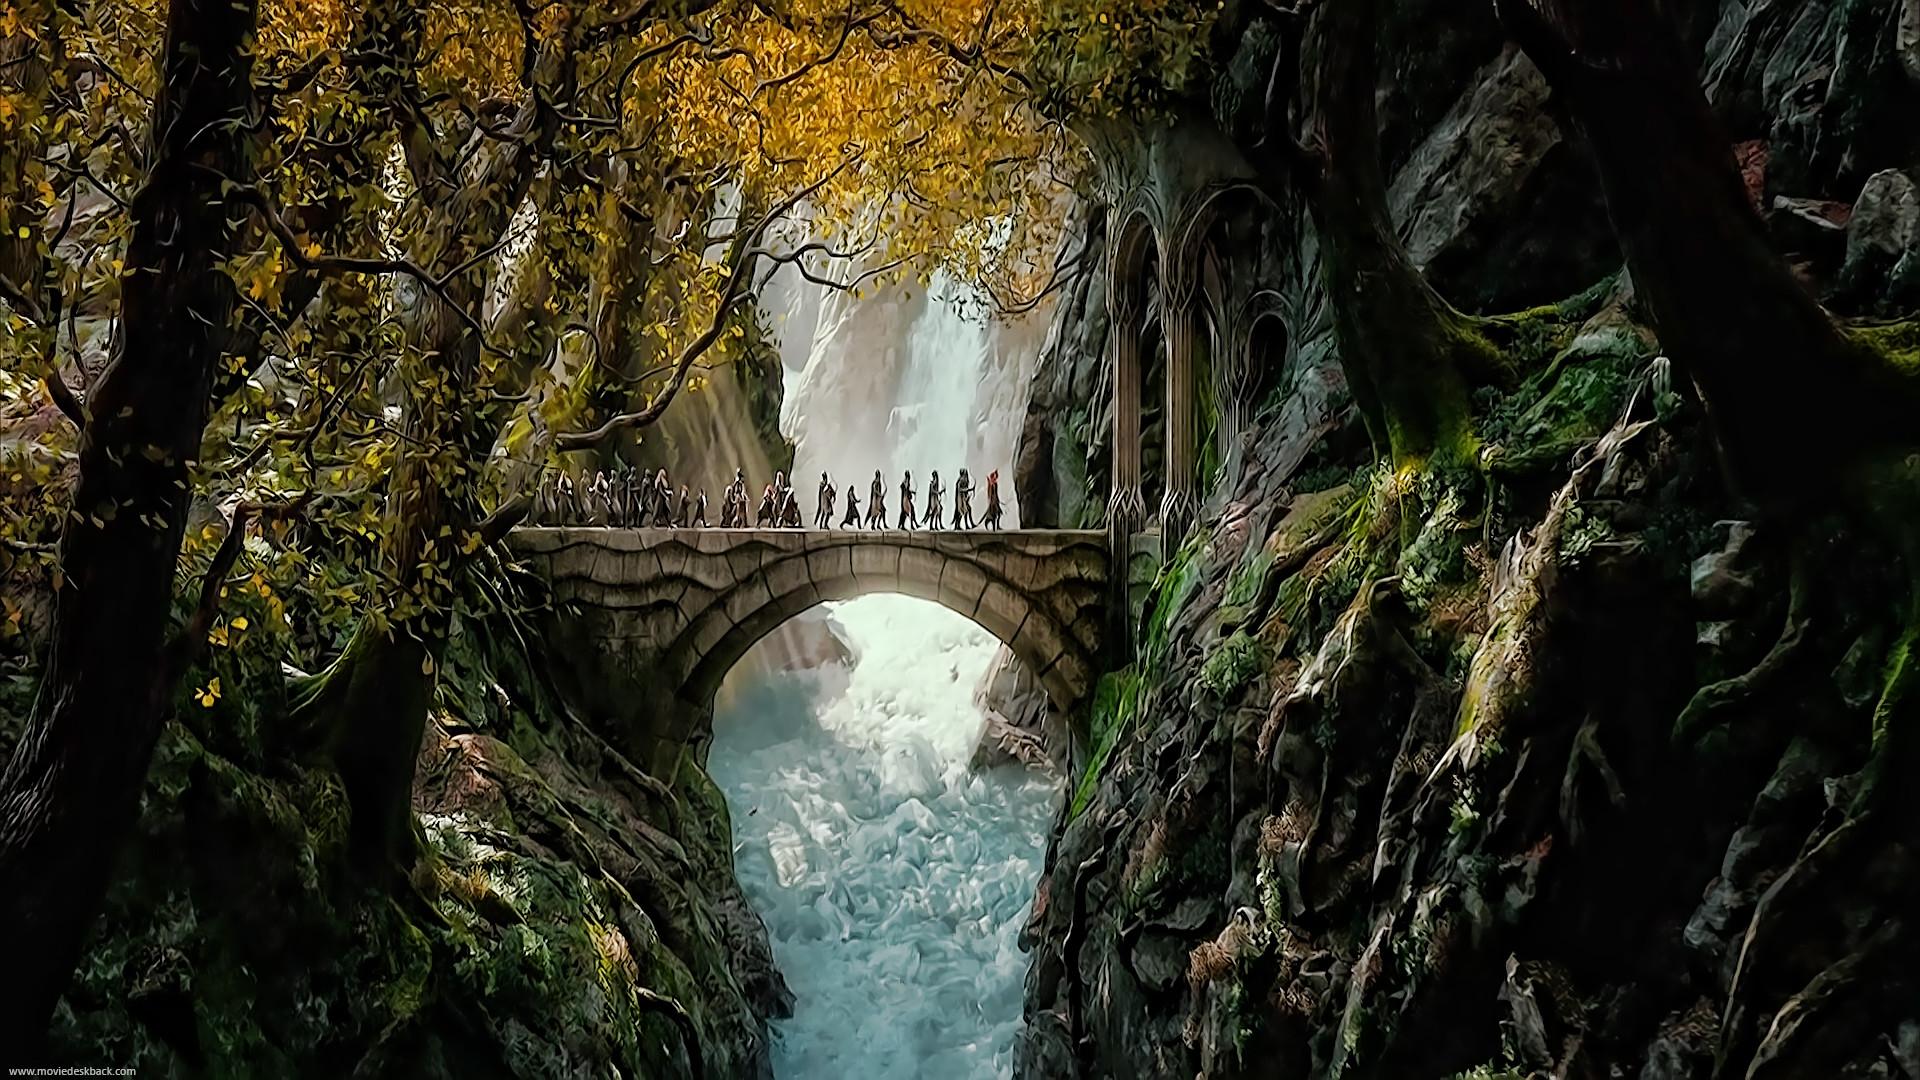 the hobbit wallpaper РGoogle keres̩s   The Hobbit   Pinterest   Hobbit,  Middle earth and Tolkien